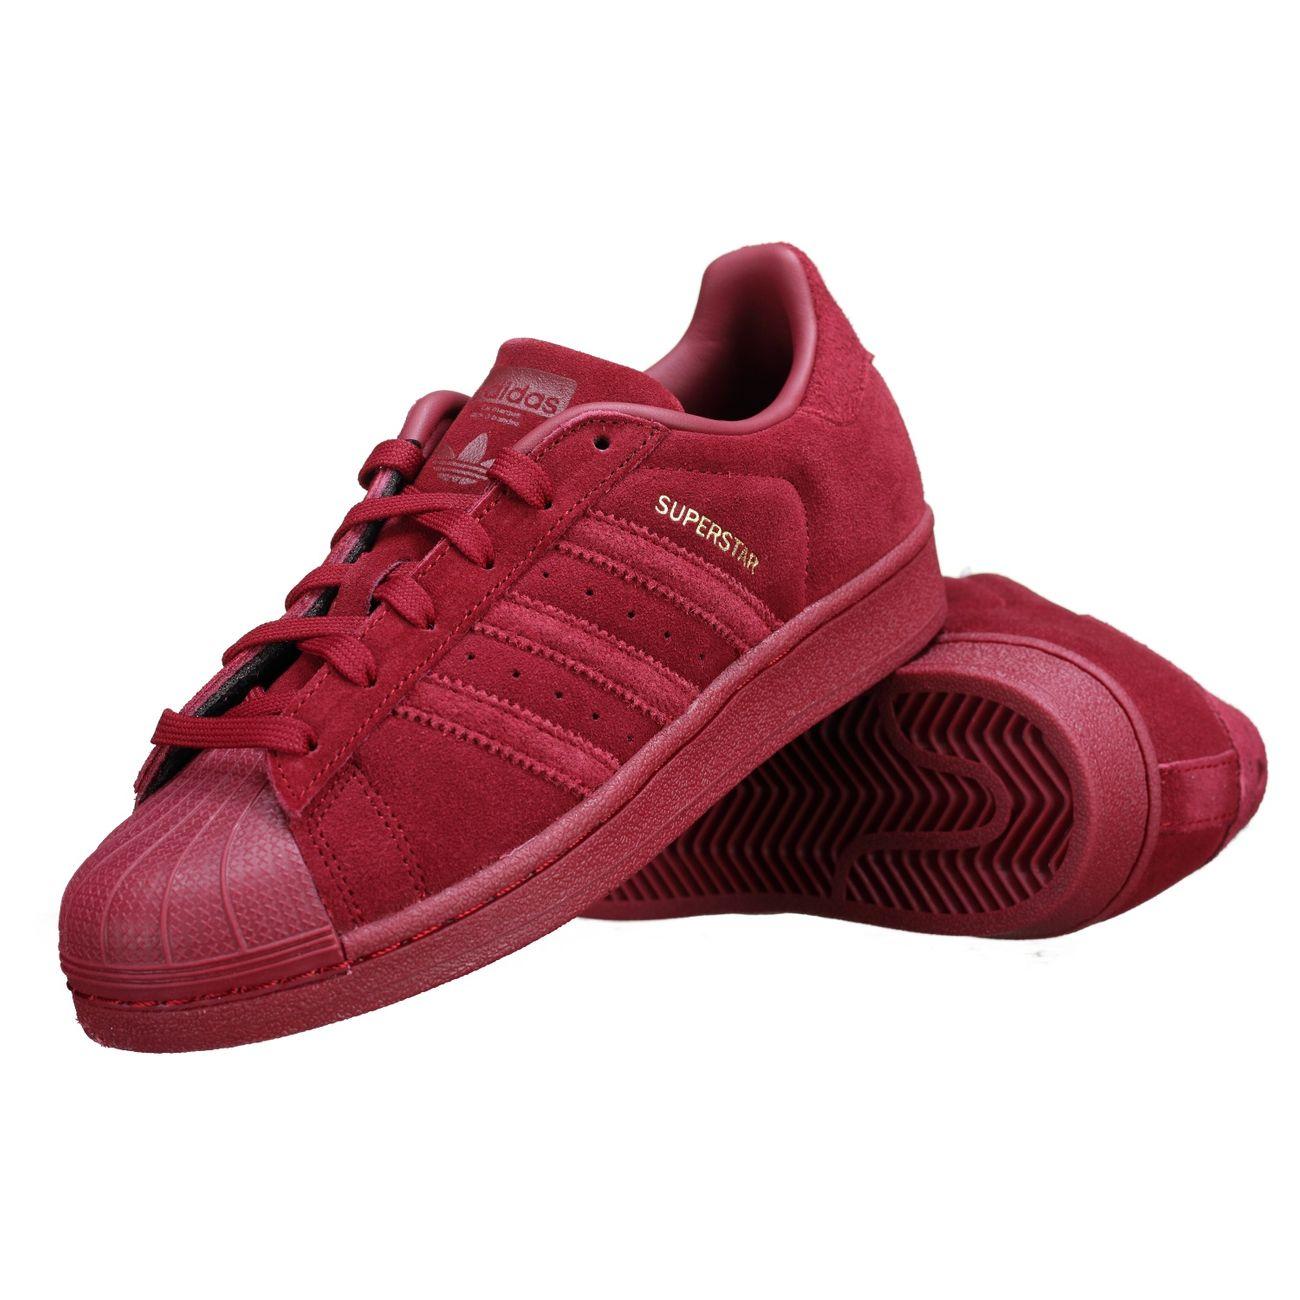 04a81d5c8b818 ... Mode- Lifestyle homme ADIDAS Basket Adidas Superstar J Cg3738 Rouge ...